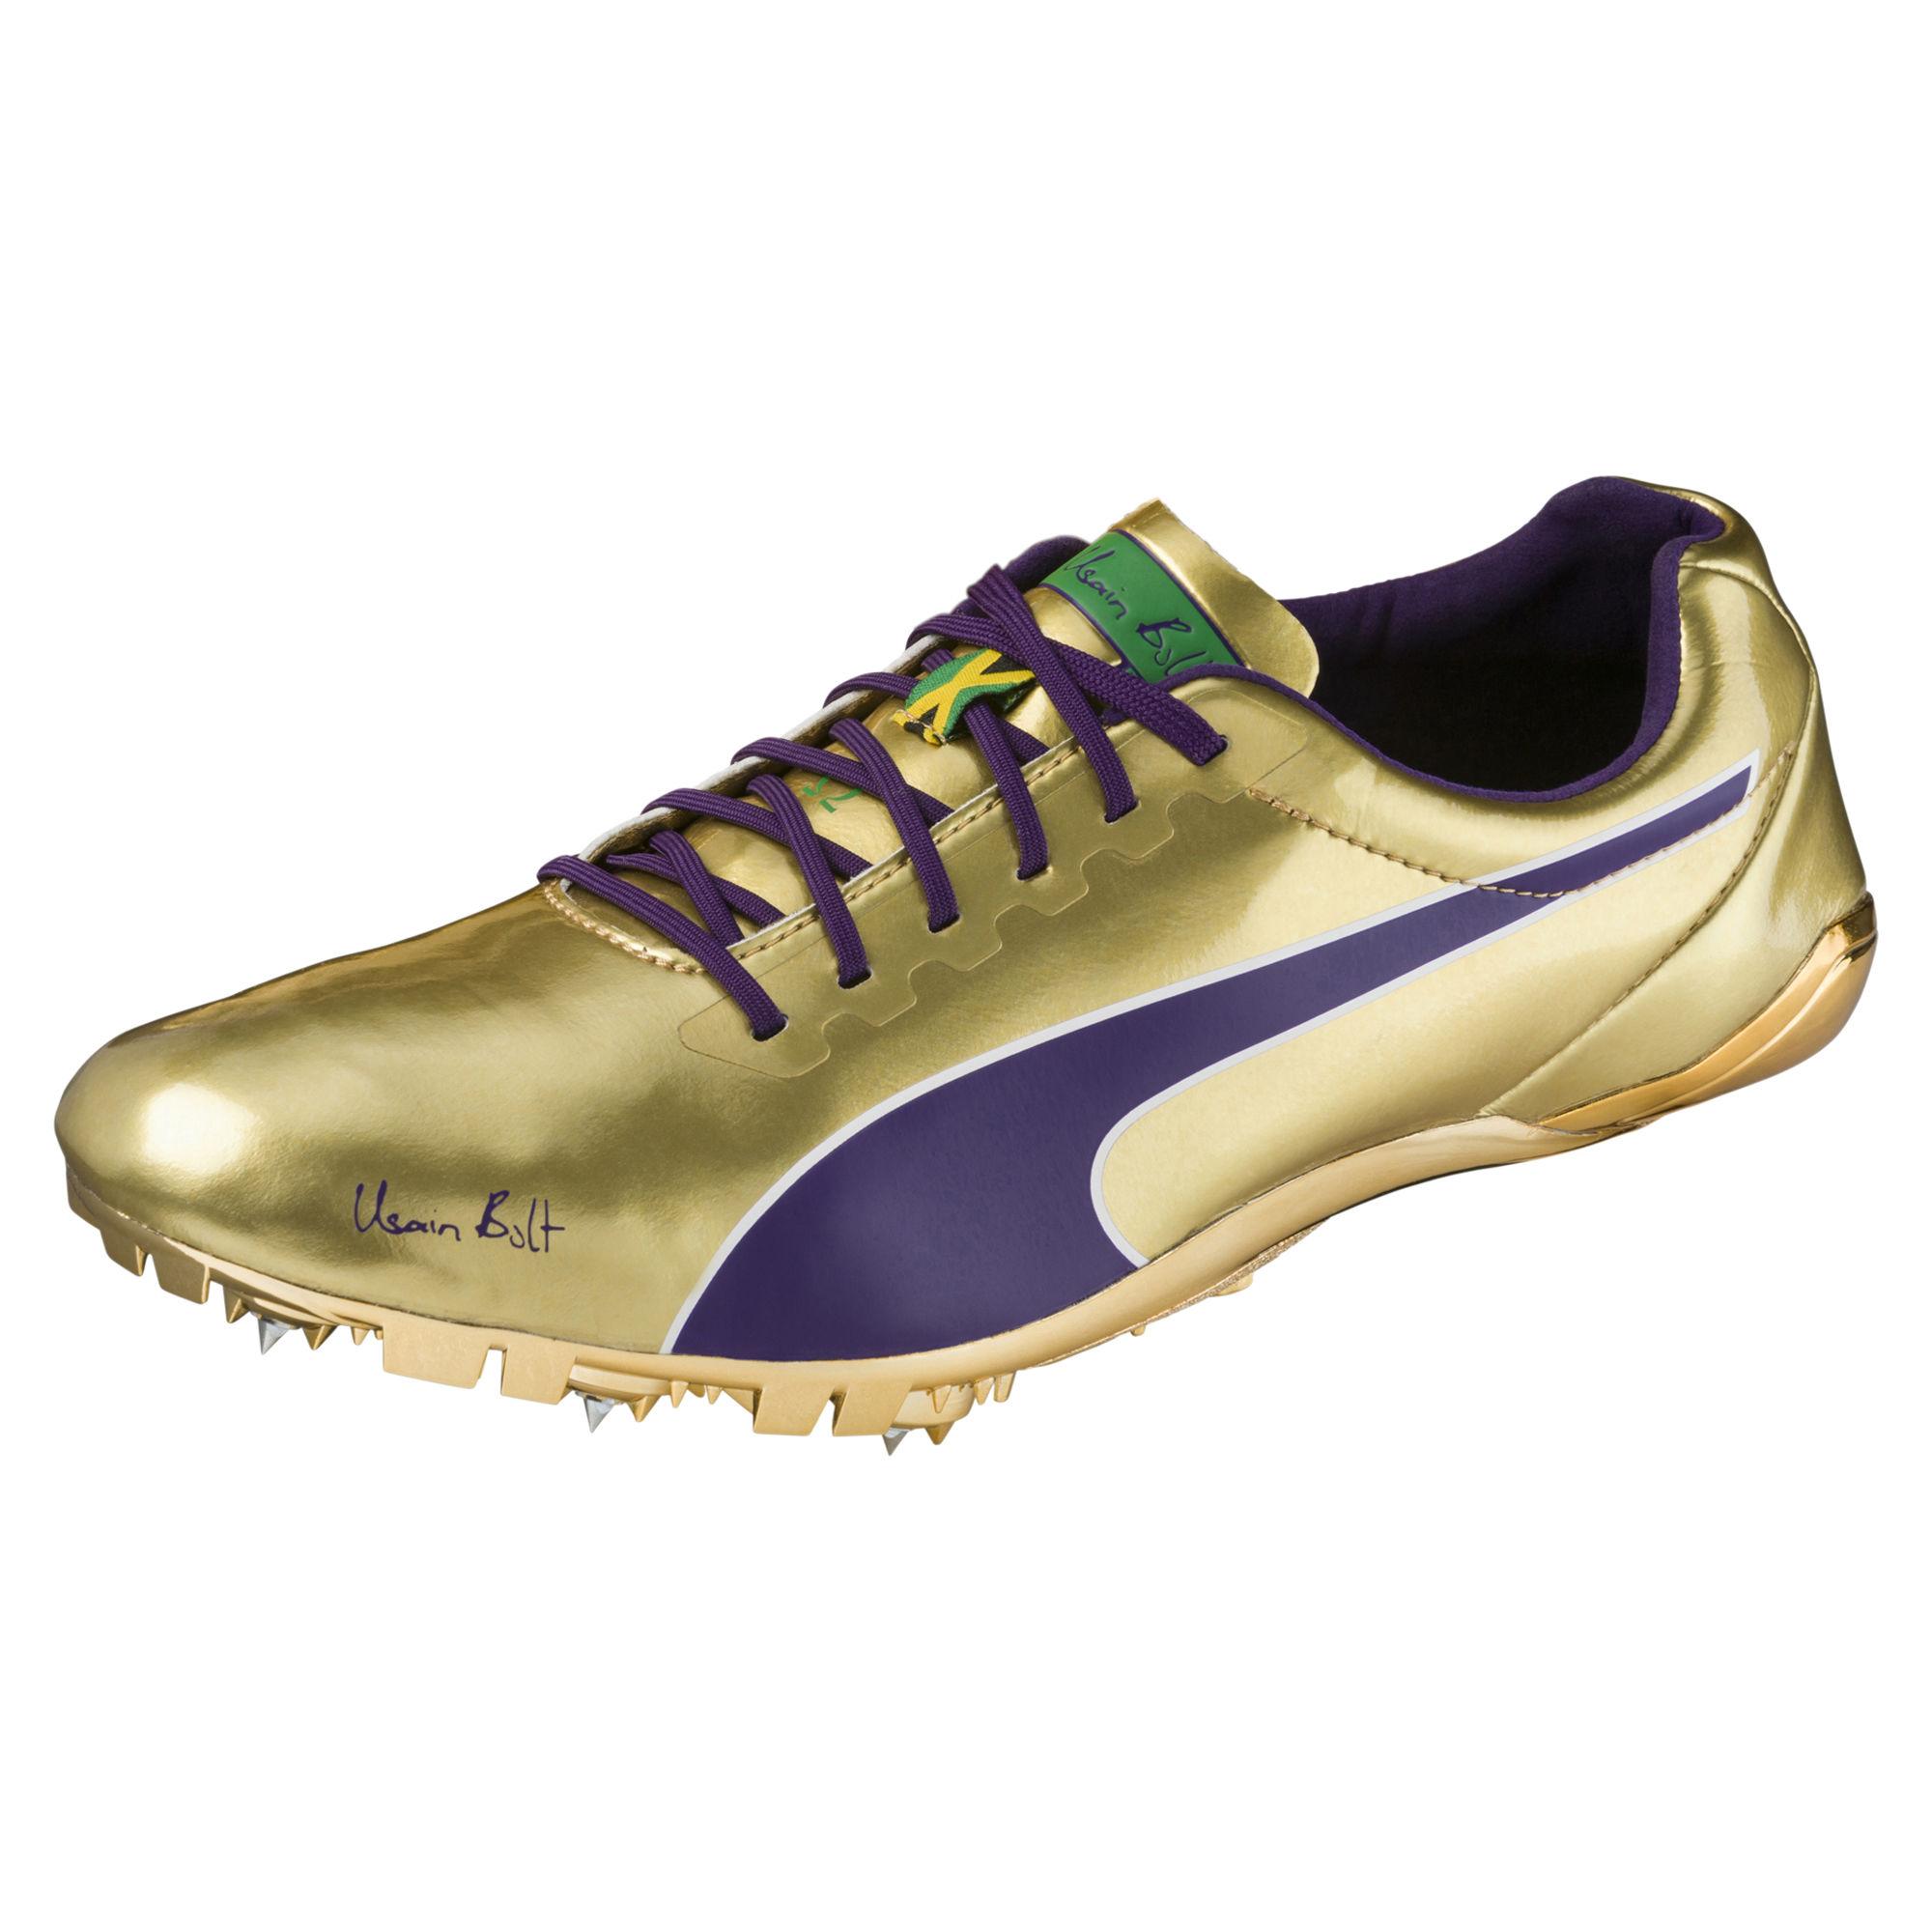 Bolt evoSPEED Электрический Legacy Spike обувь